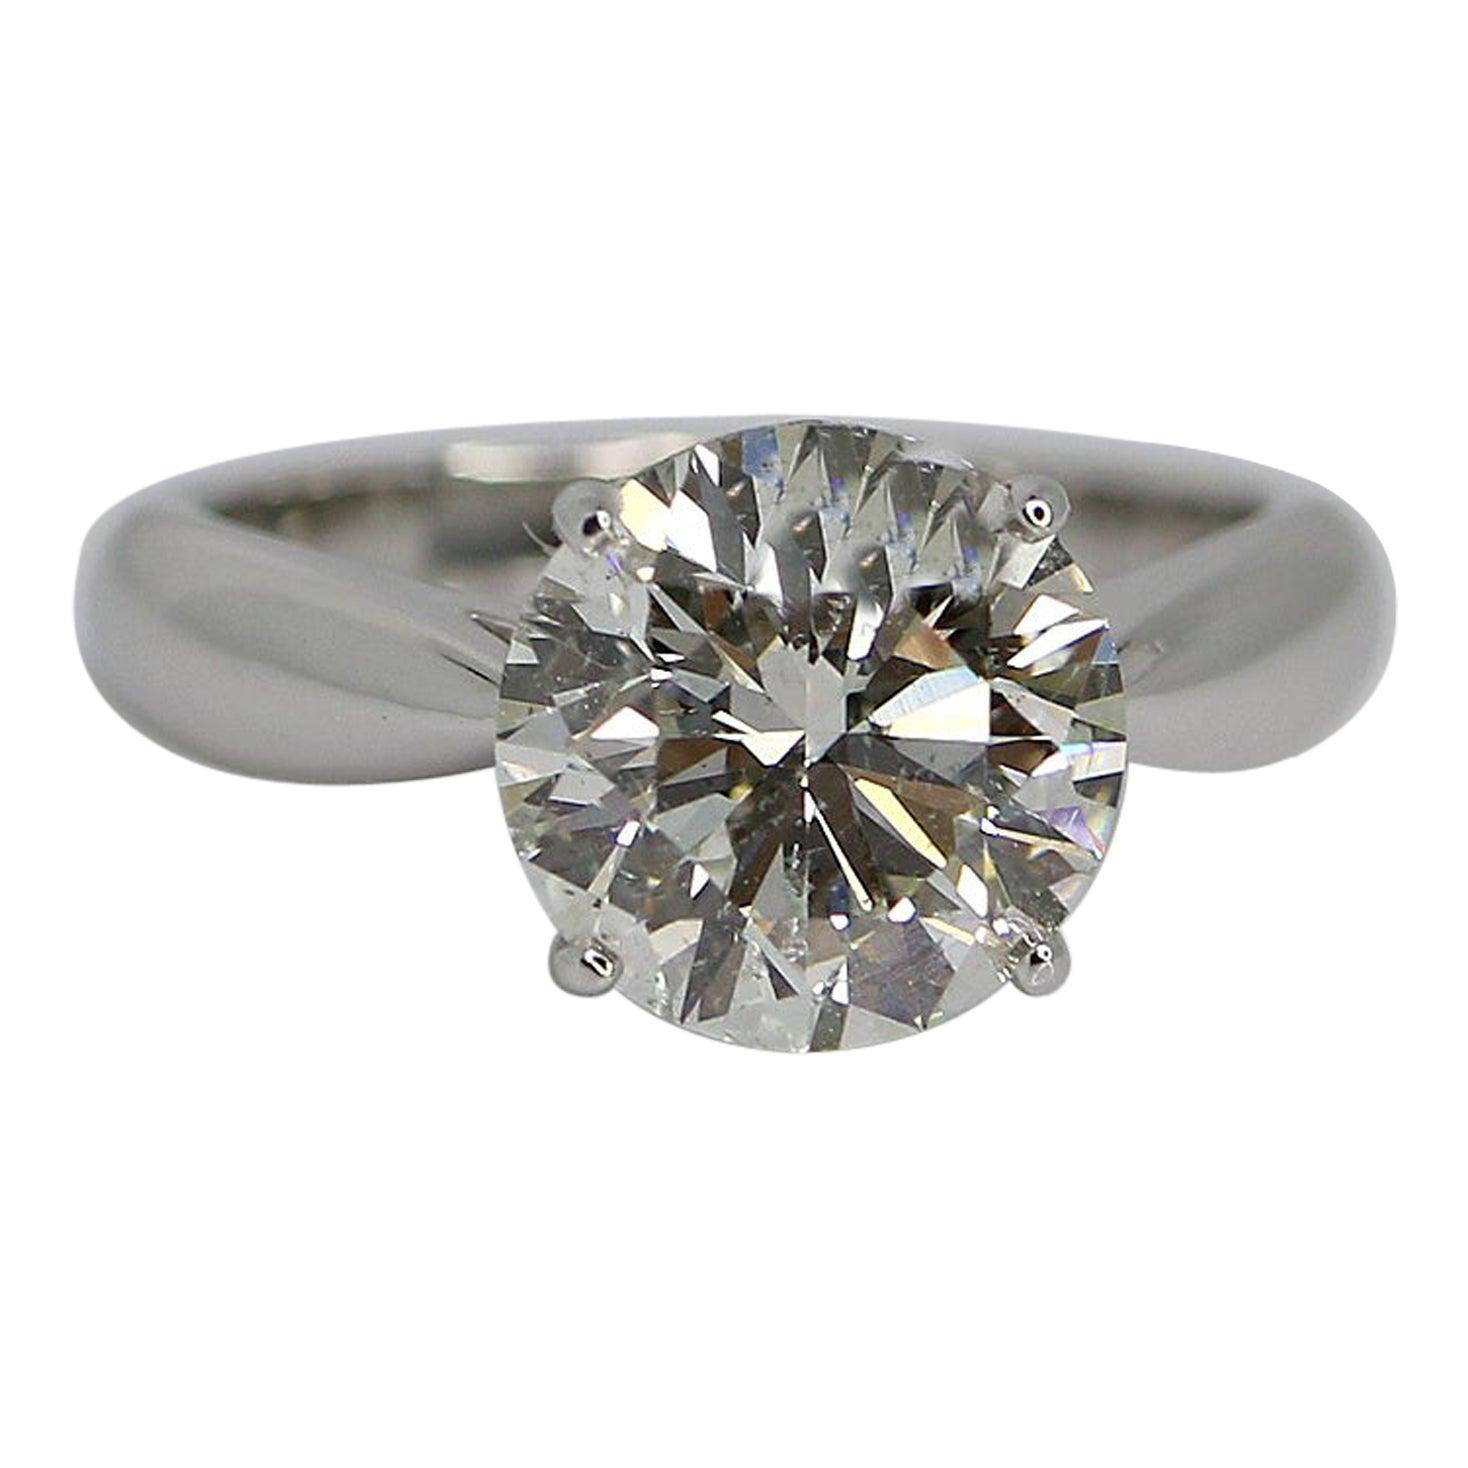 GIA Certified 3.58 Carat Round Brilliant Diamond Ring